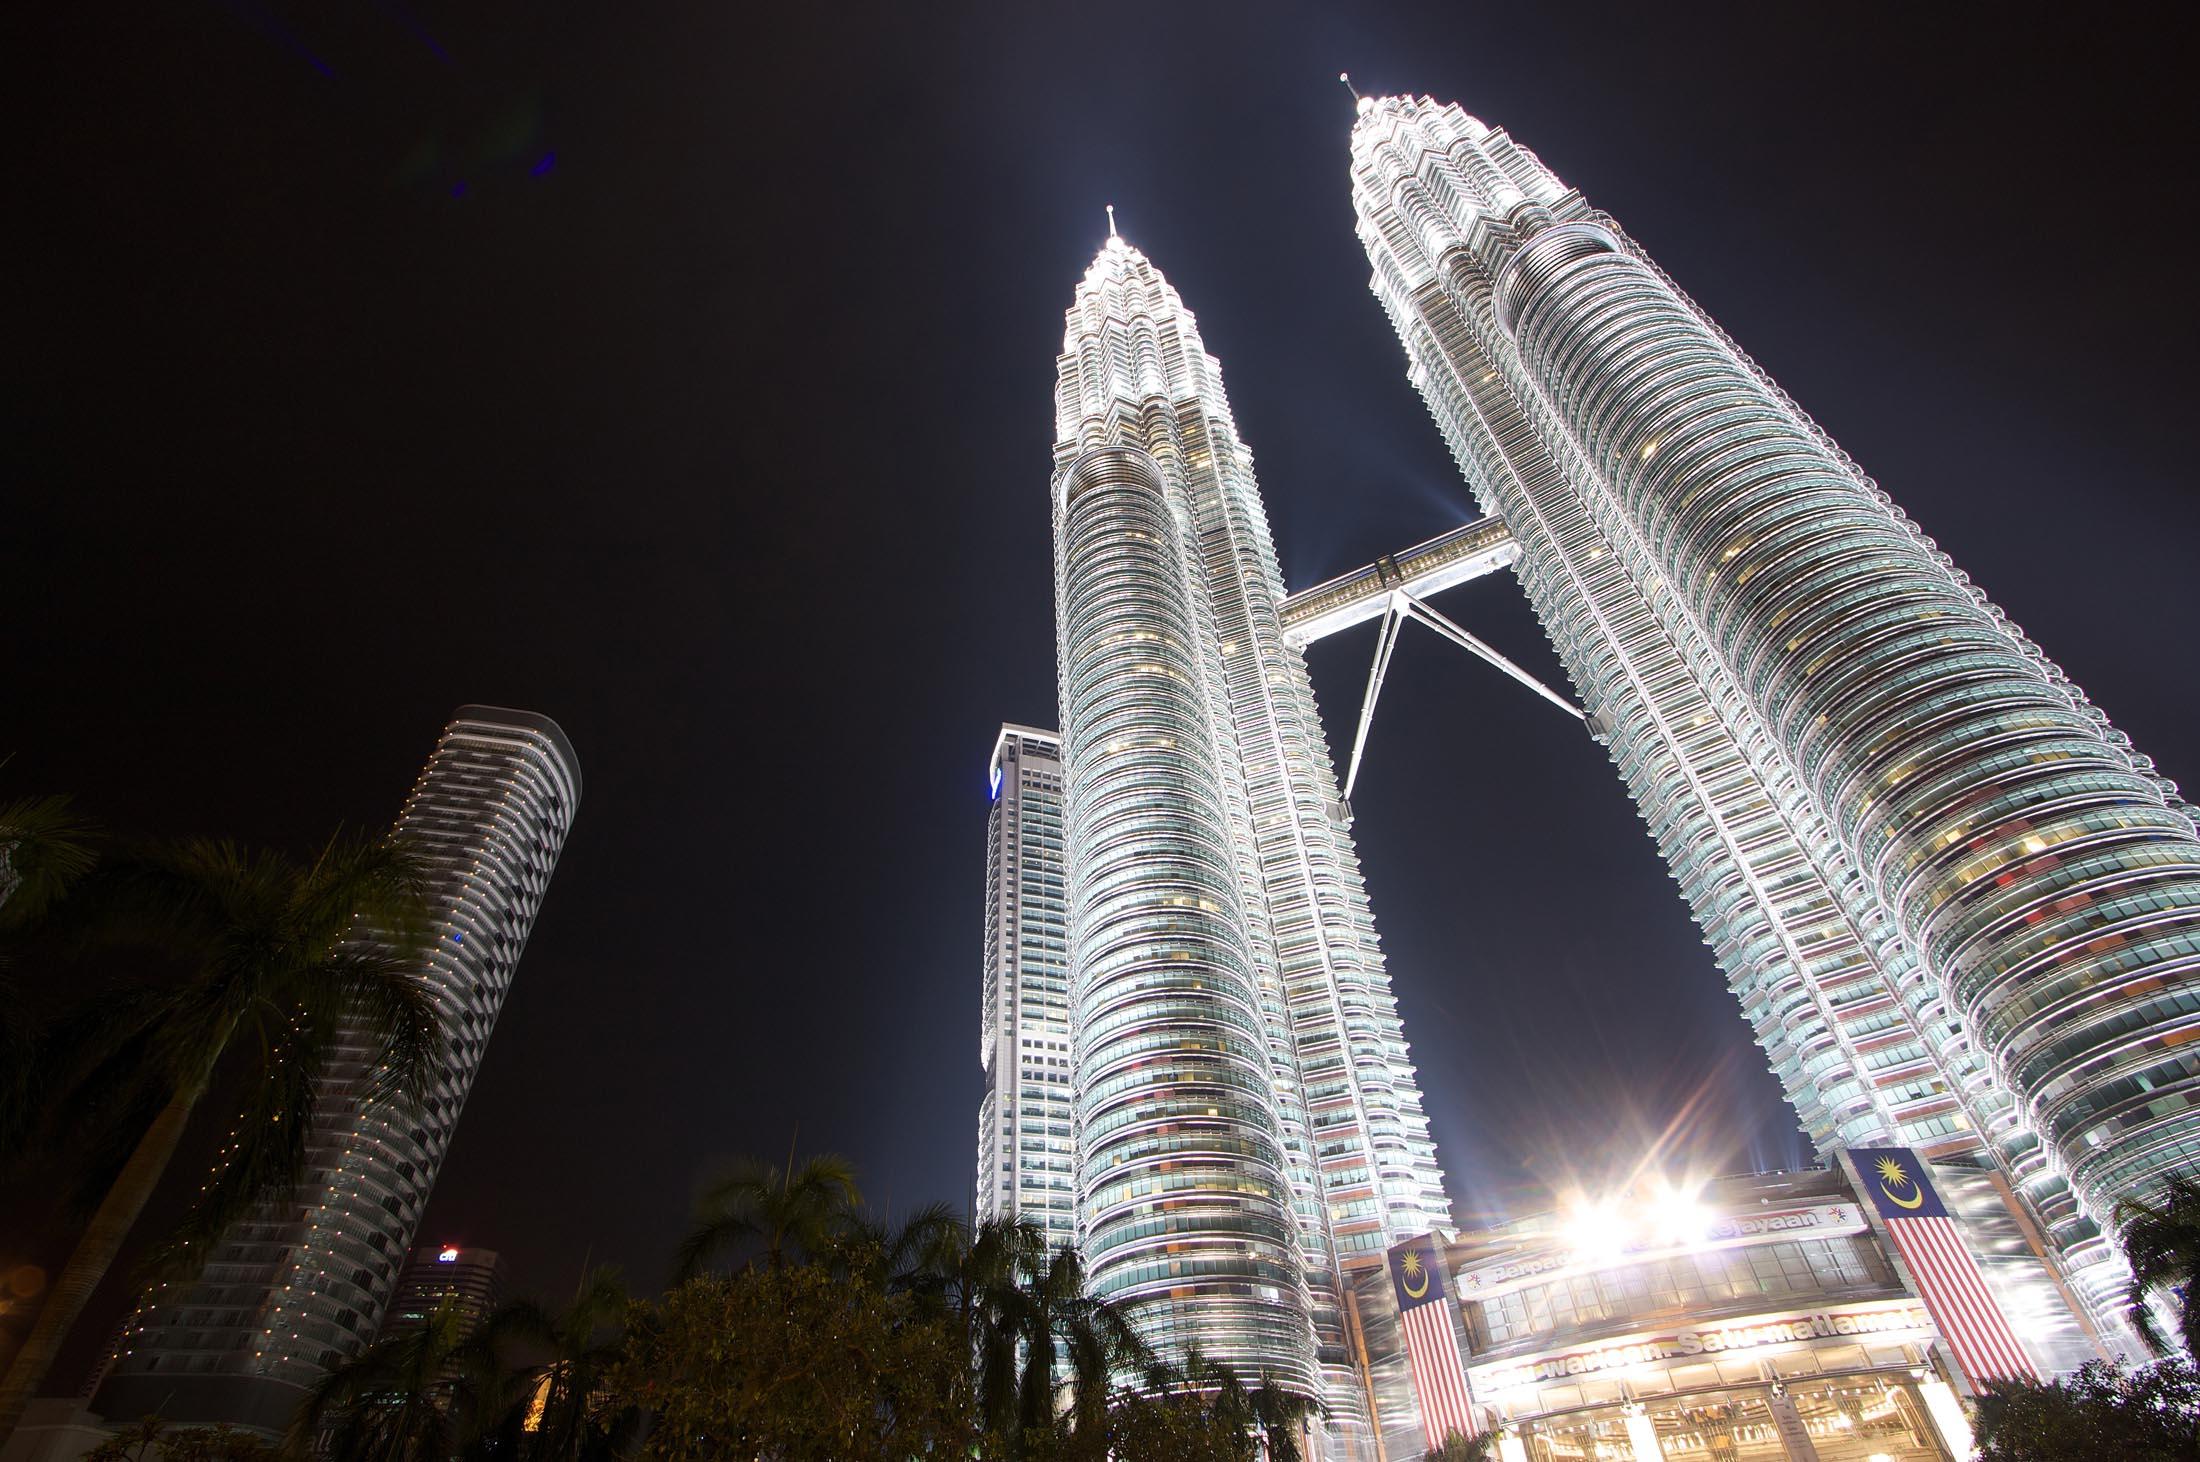 The Petronas Twins, Kuala Lumpur, Malaysia